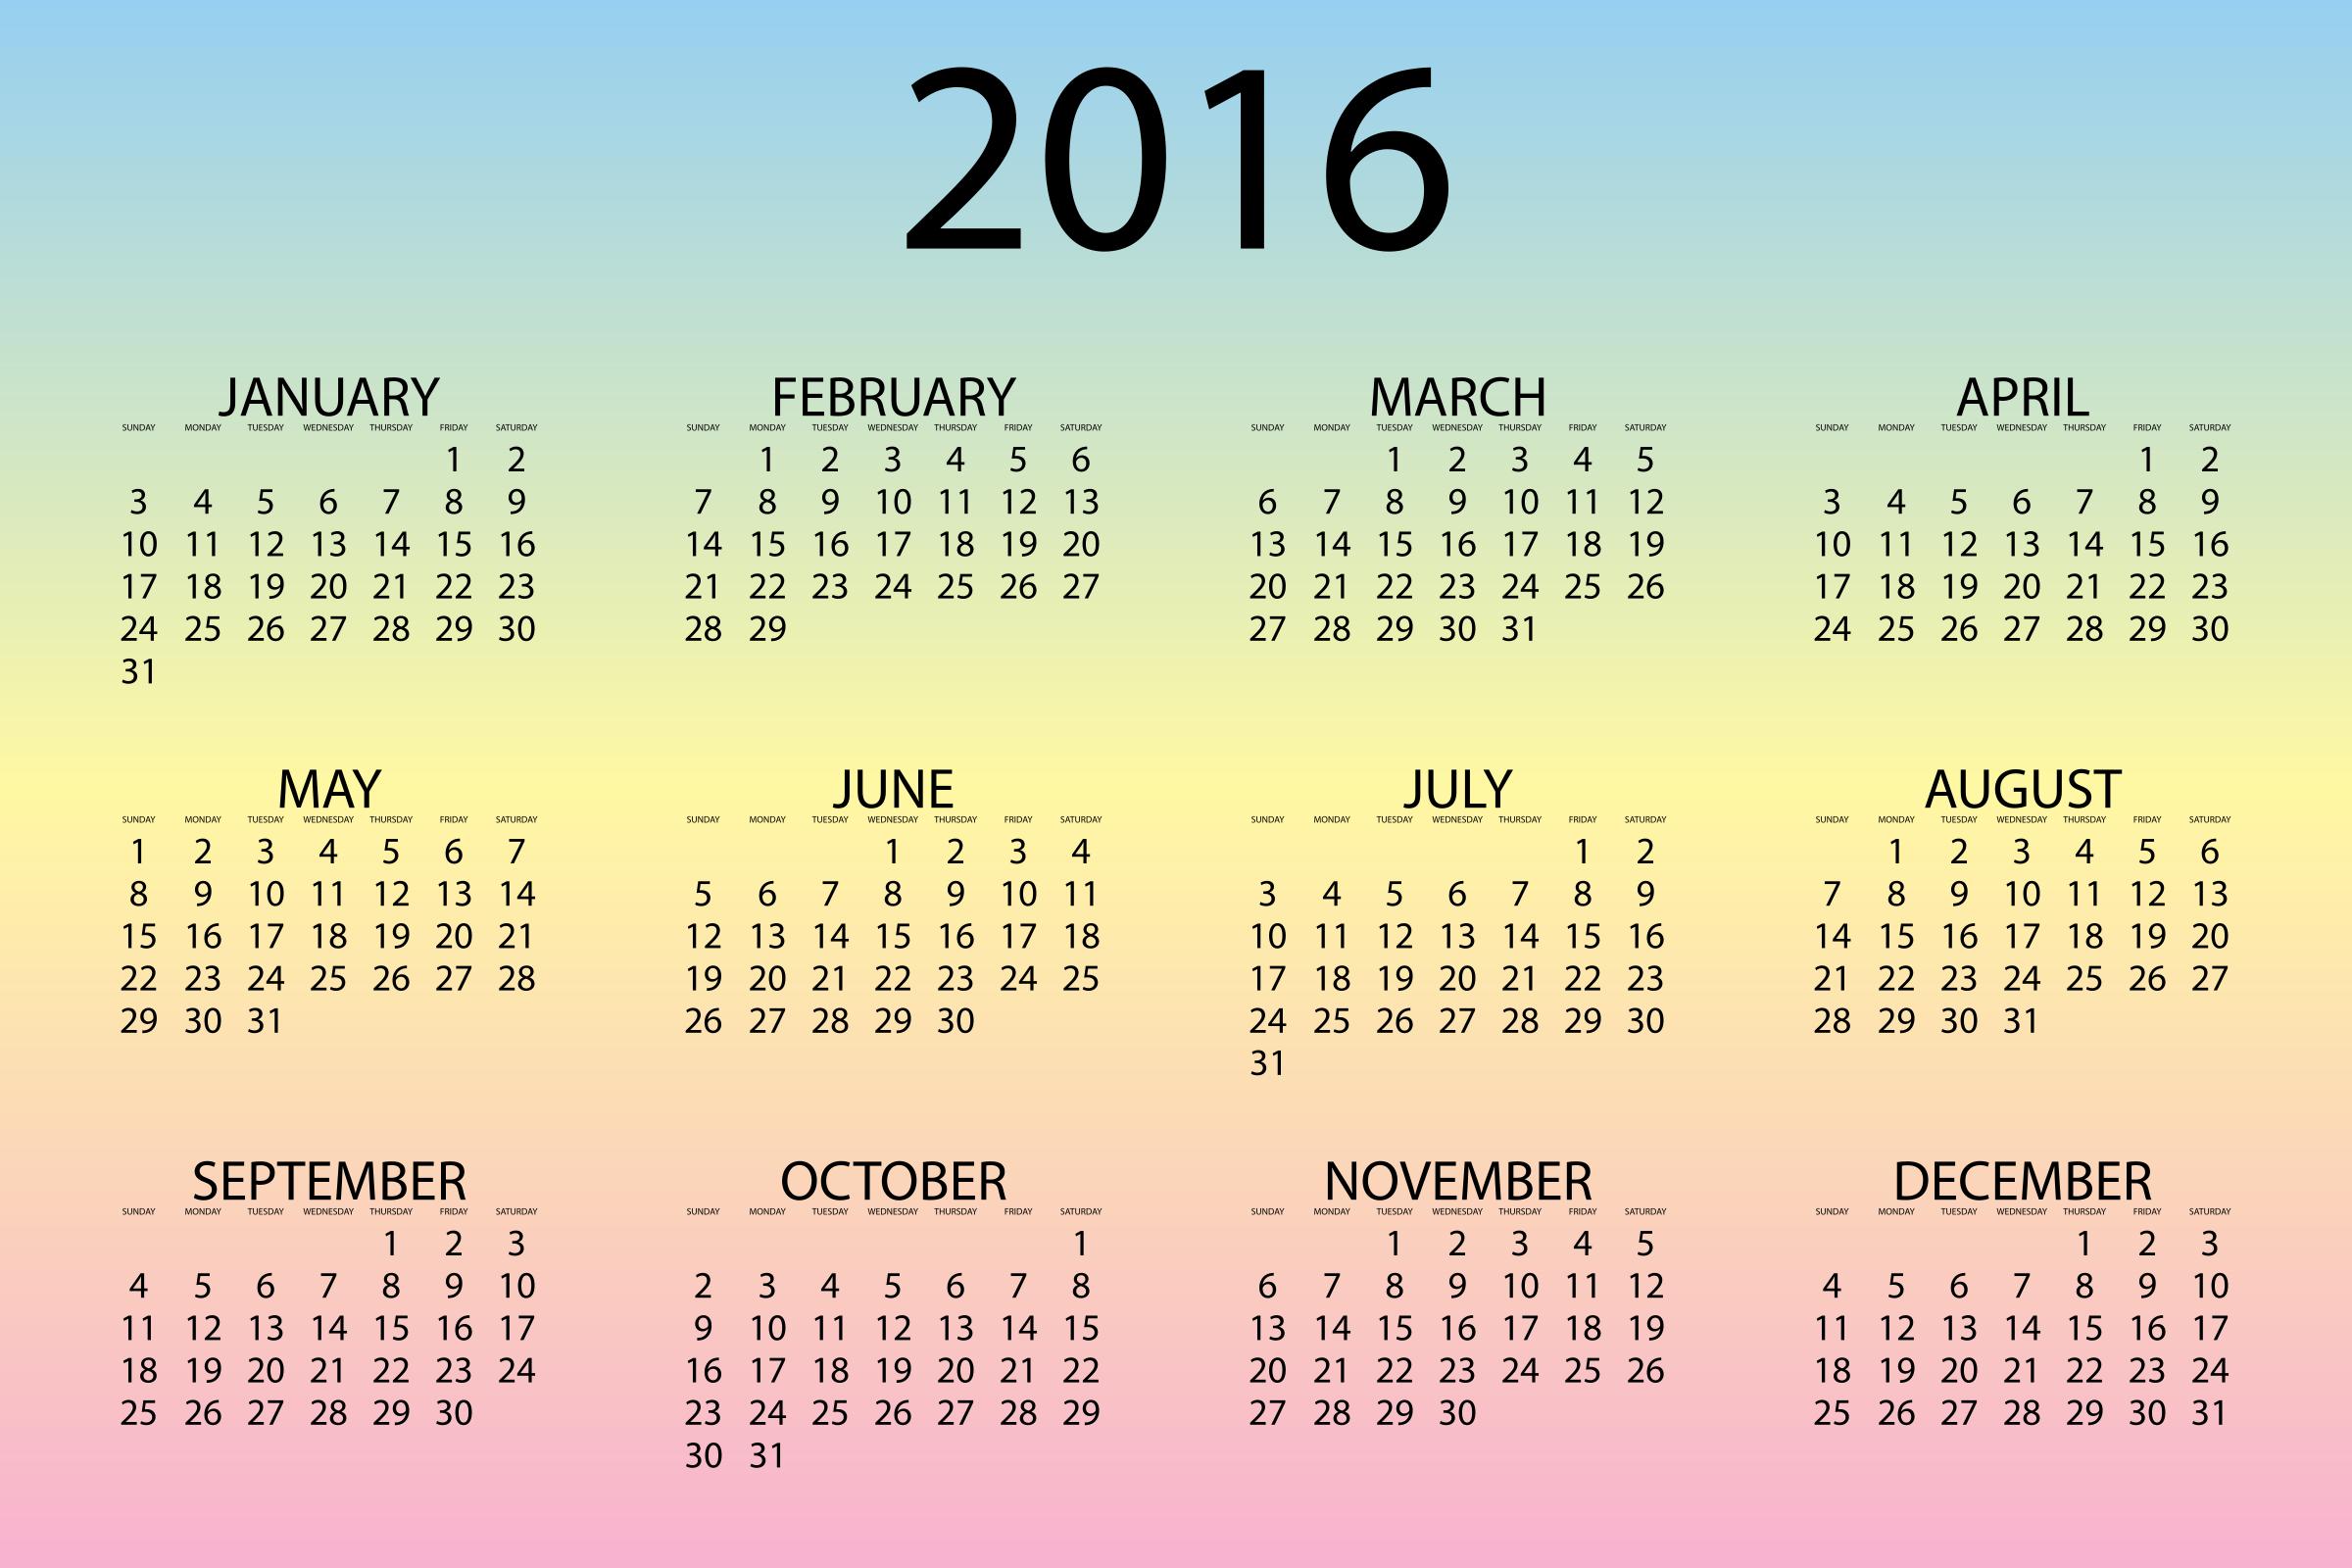 2016 Calendar Pastel by GDJ 2400x1600